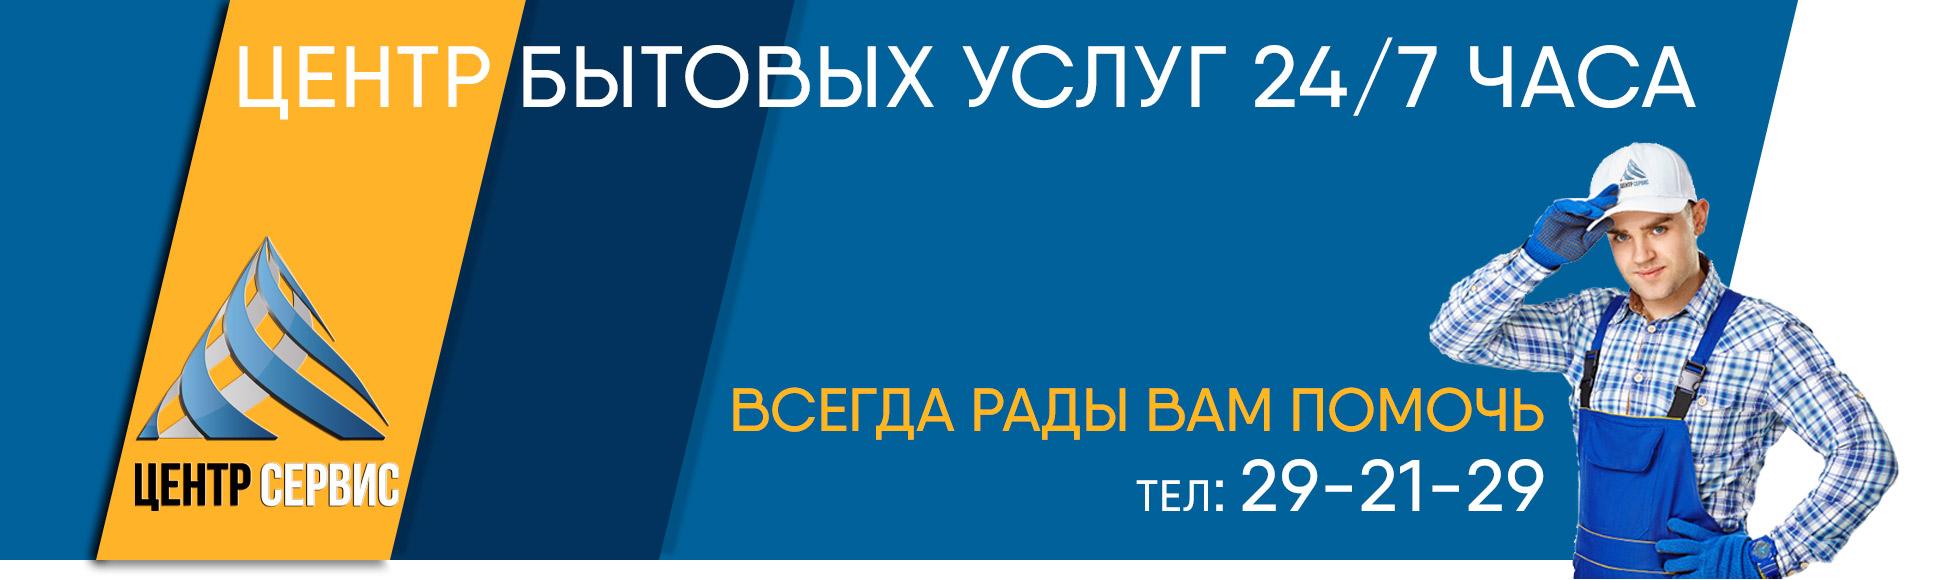 Центр сервис Омск